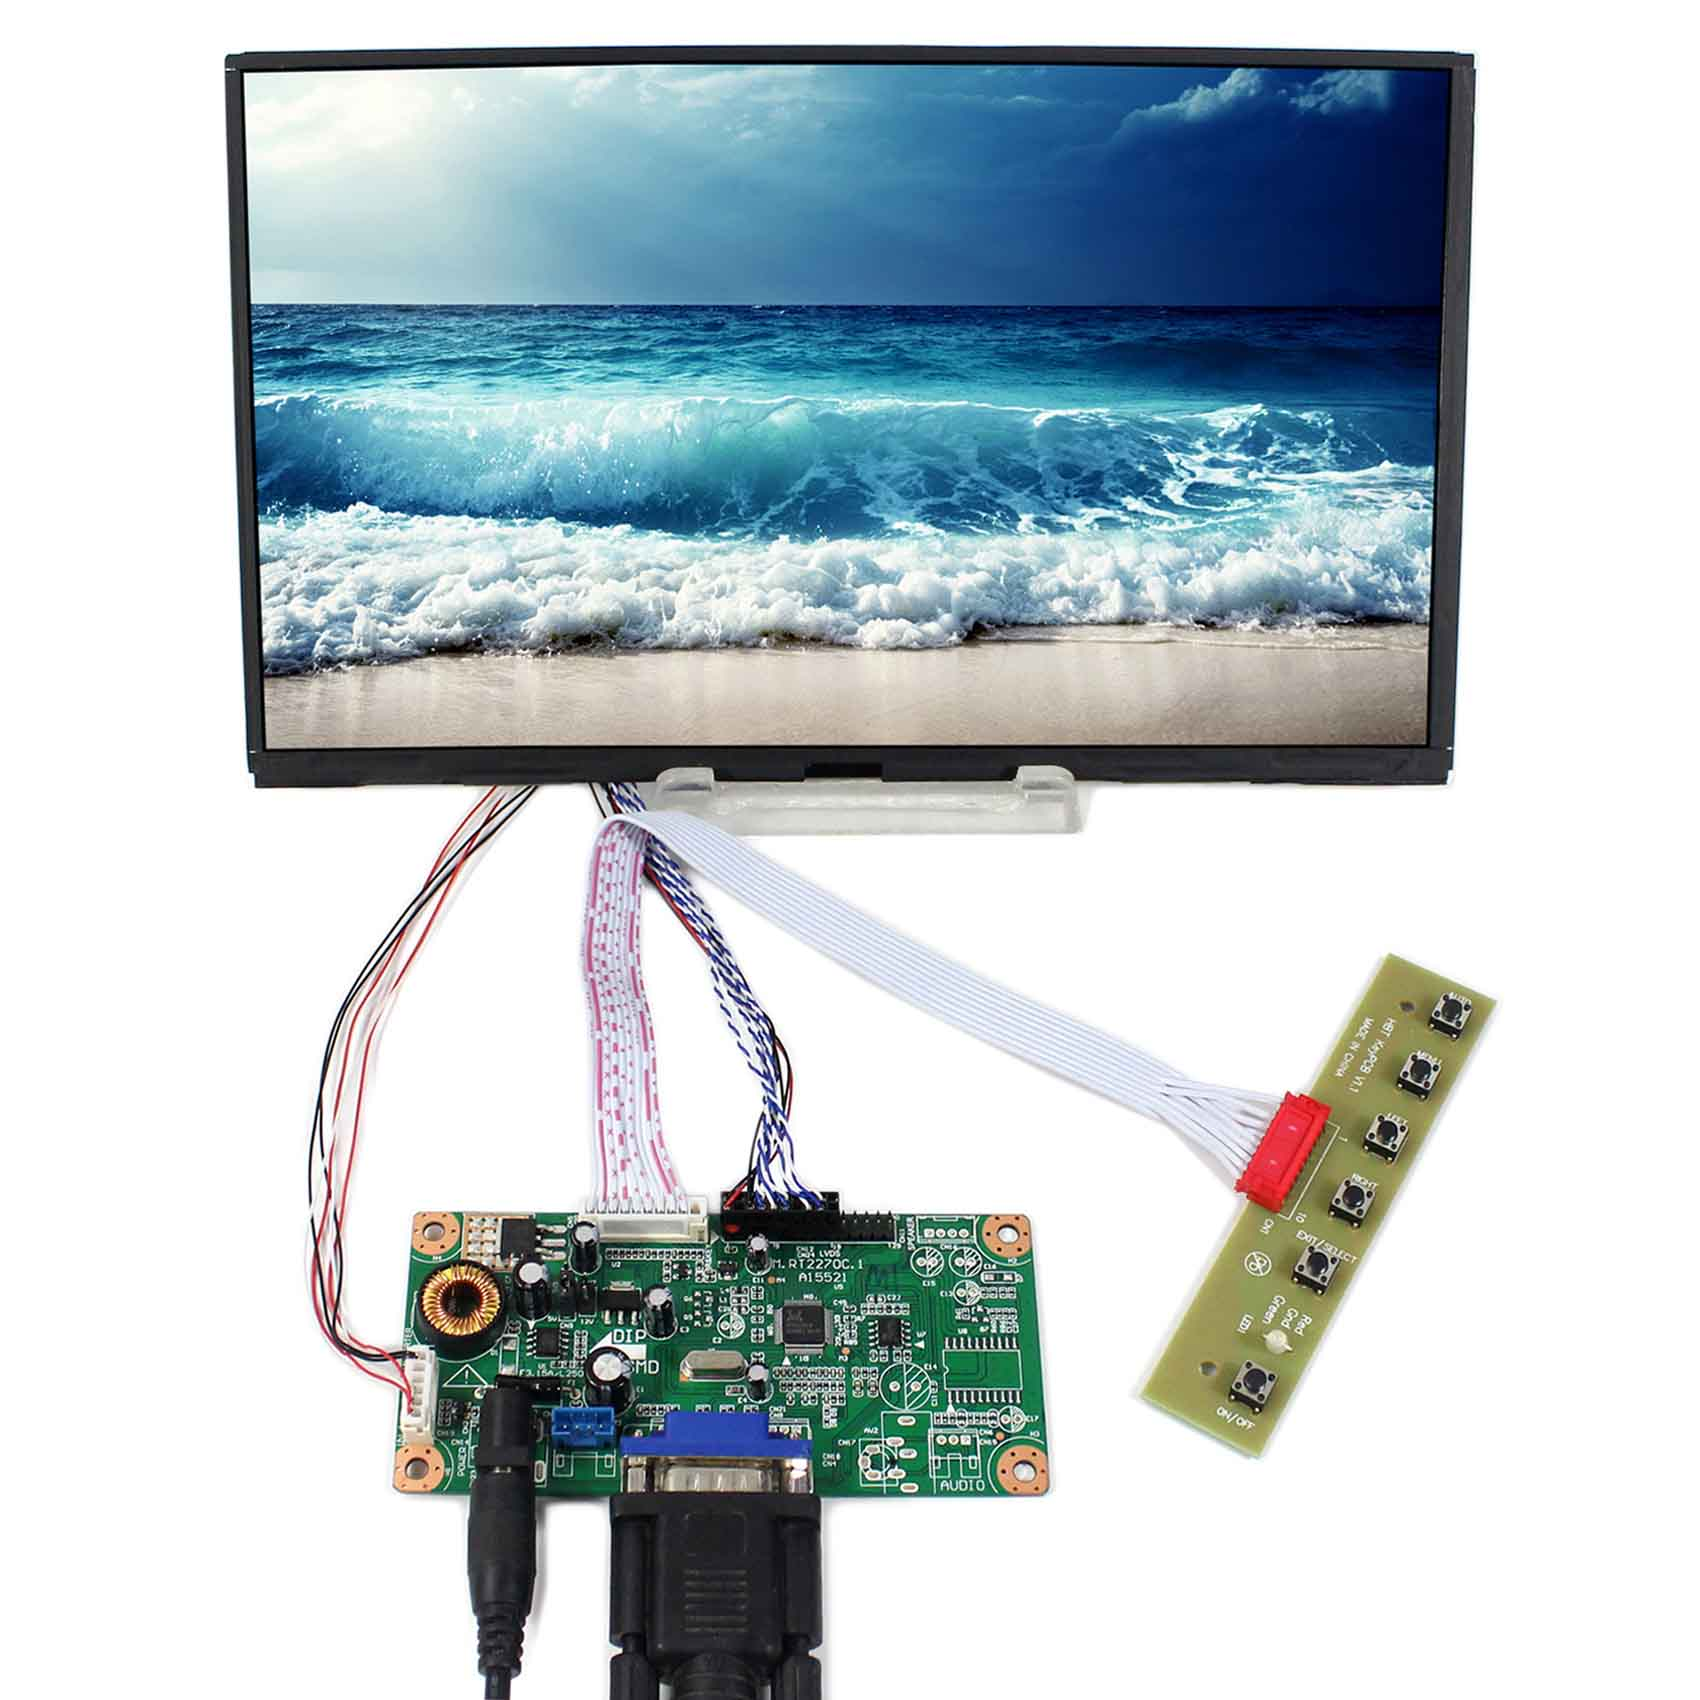 VGA LCD Controller Board RT2270C-A With 10.1inch 1366x768 B101XAN01.3 IPS LCD Screen Model LCD for Raspberry Pi vga hdmi lcd controller board for lp156whu tpb1 lp156whu tpa1 lp156whu tpbh lp156whu tpd1 15 6 inch edp 30 pins 1 lane 1366x768